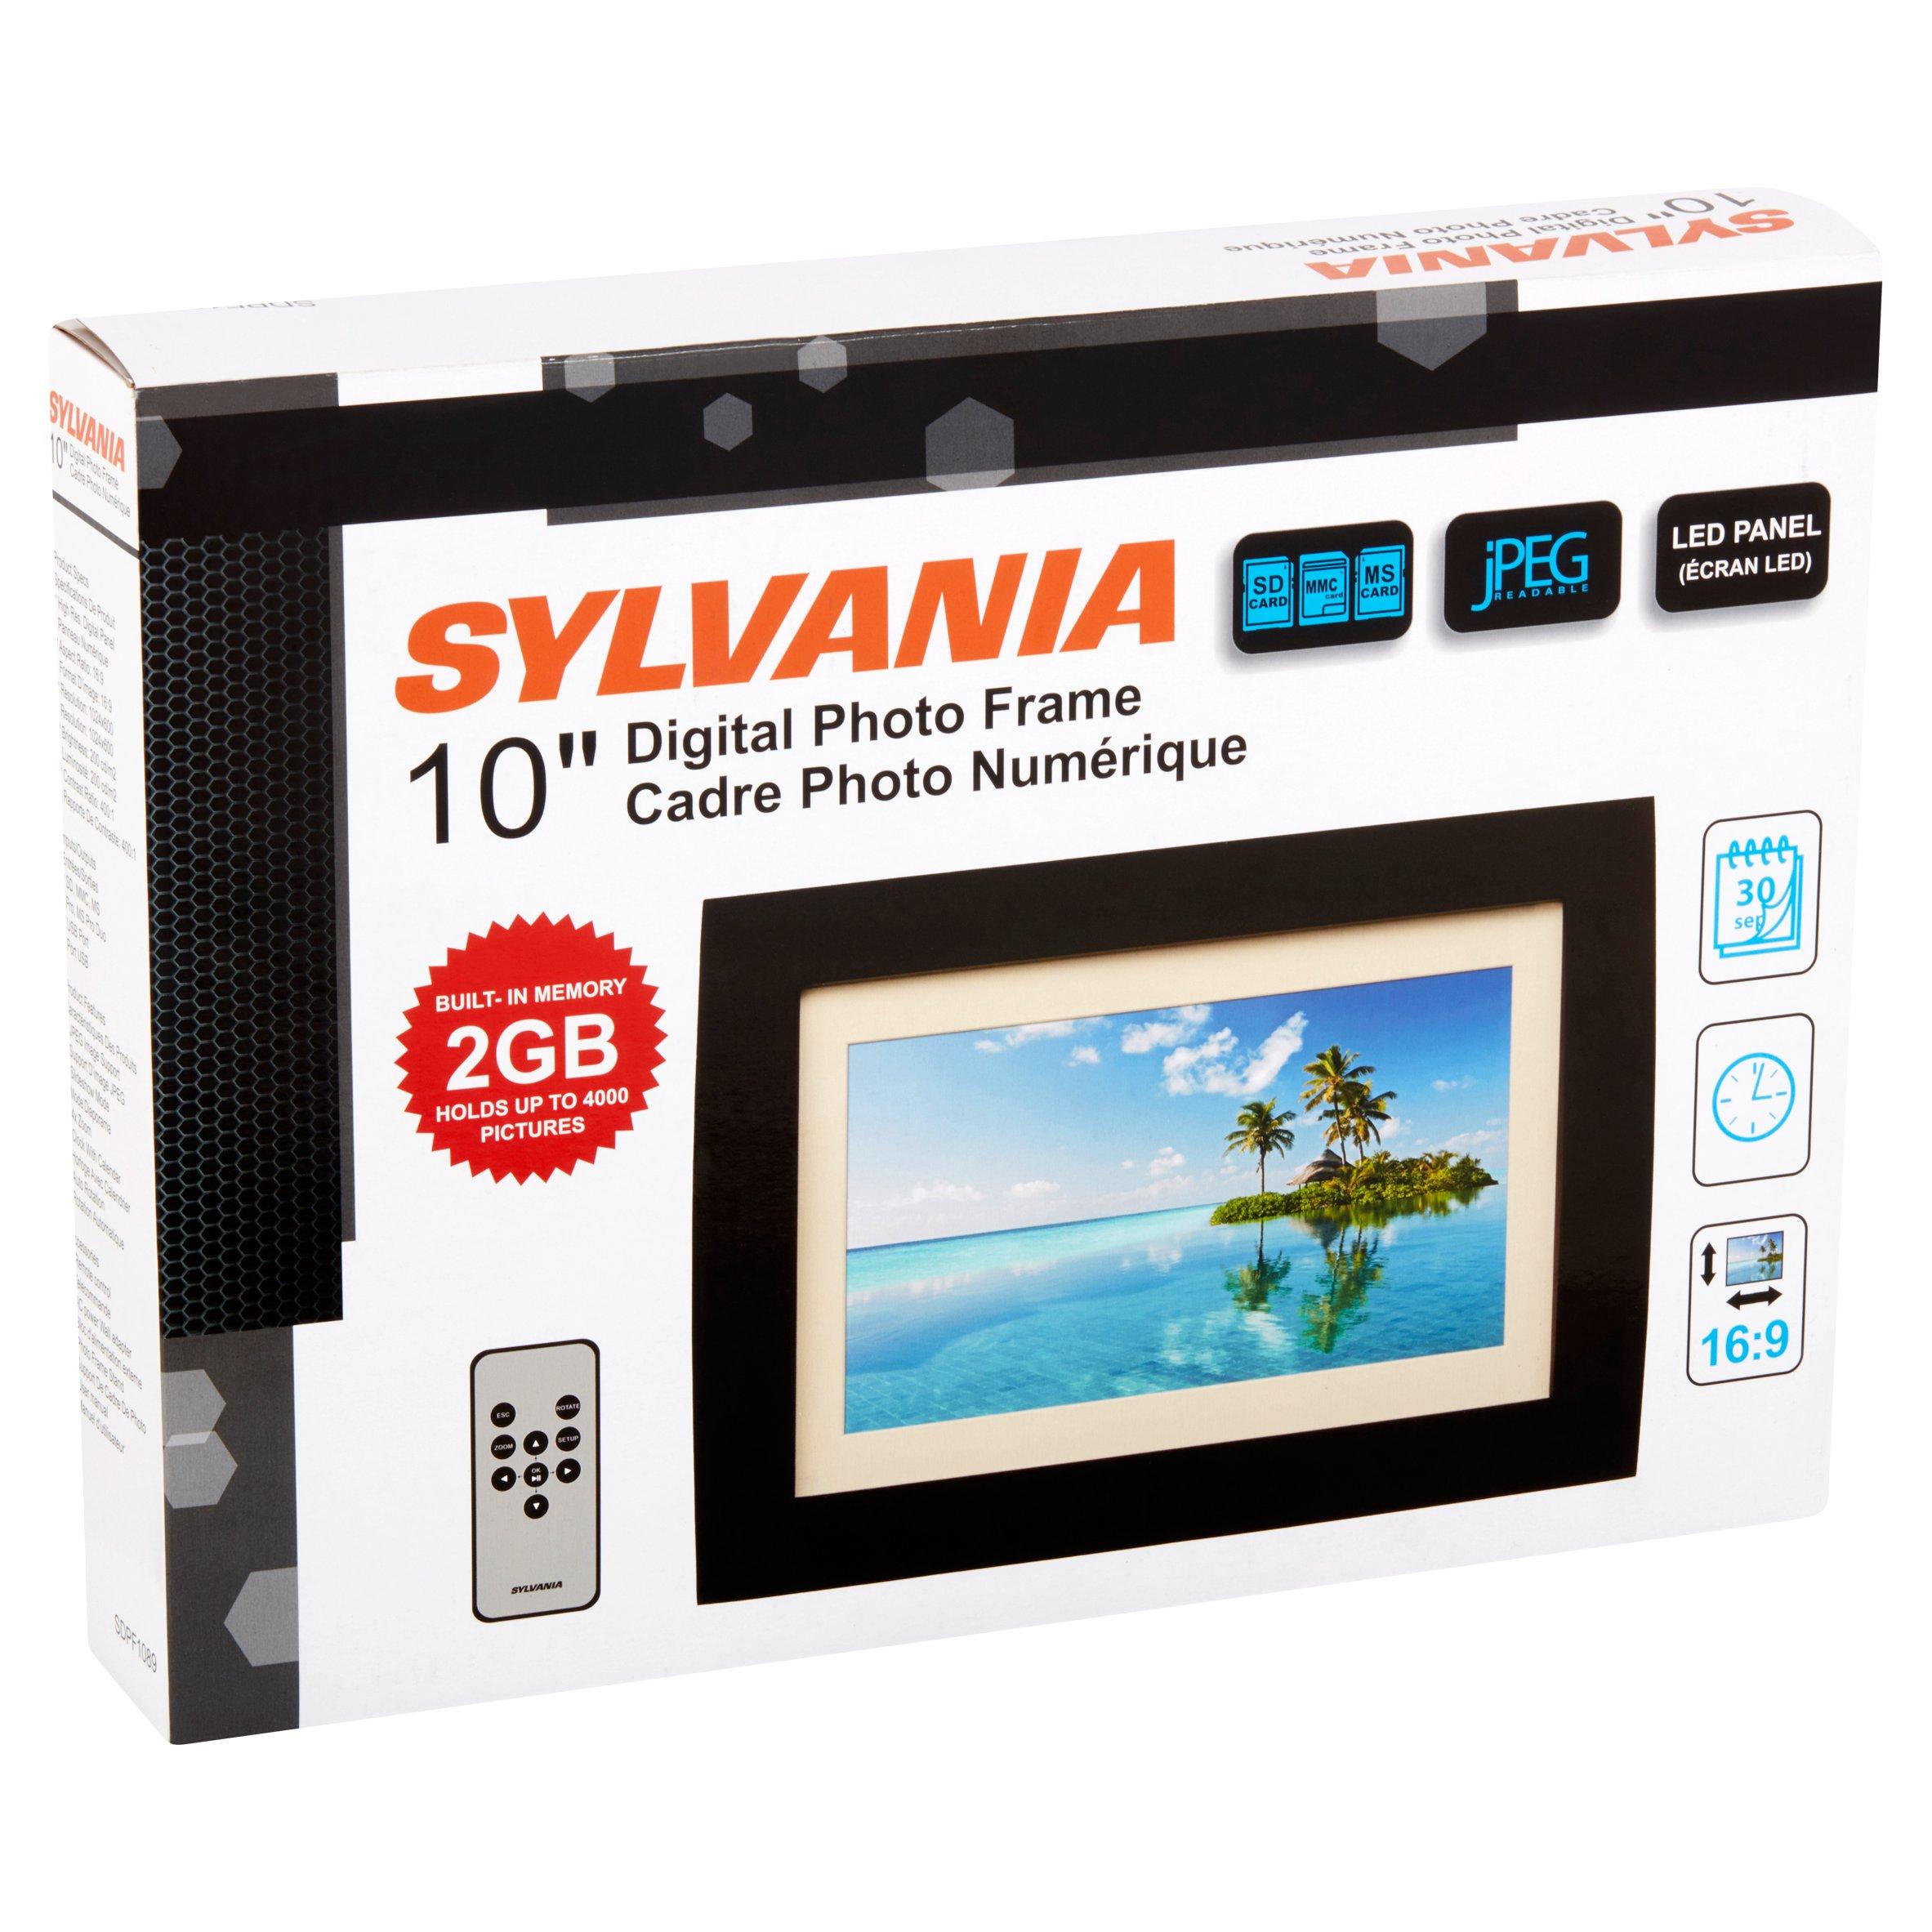 Berühmt Sylvania Digital Picture Frame Galerie - Benutzerdefinierte ...